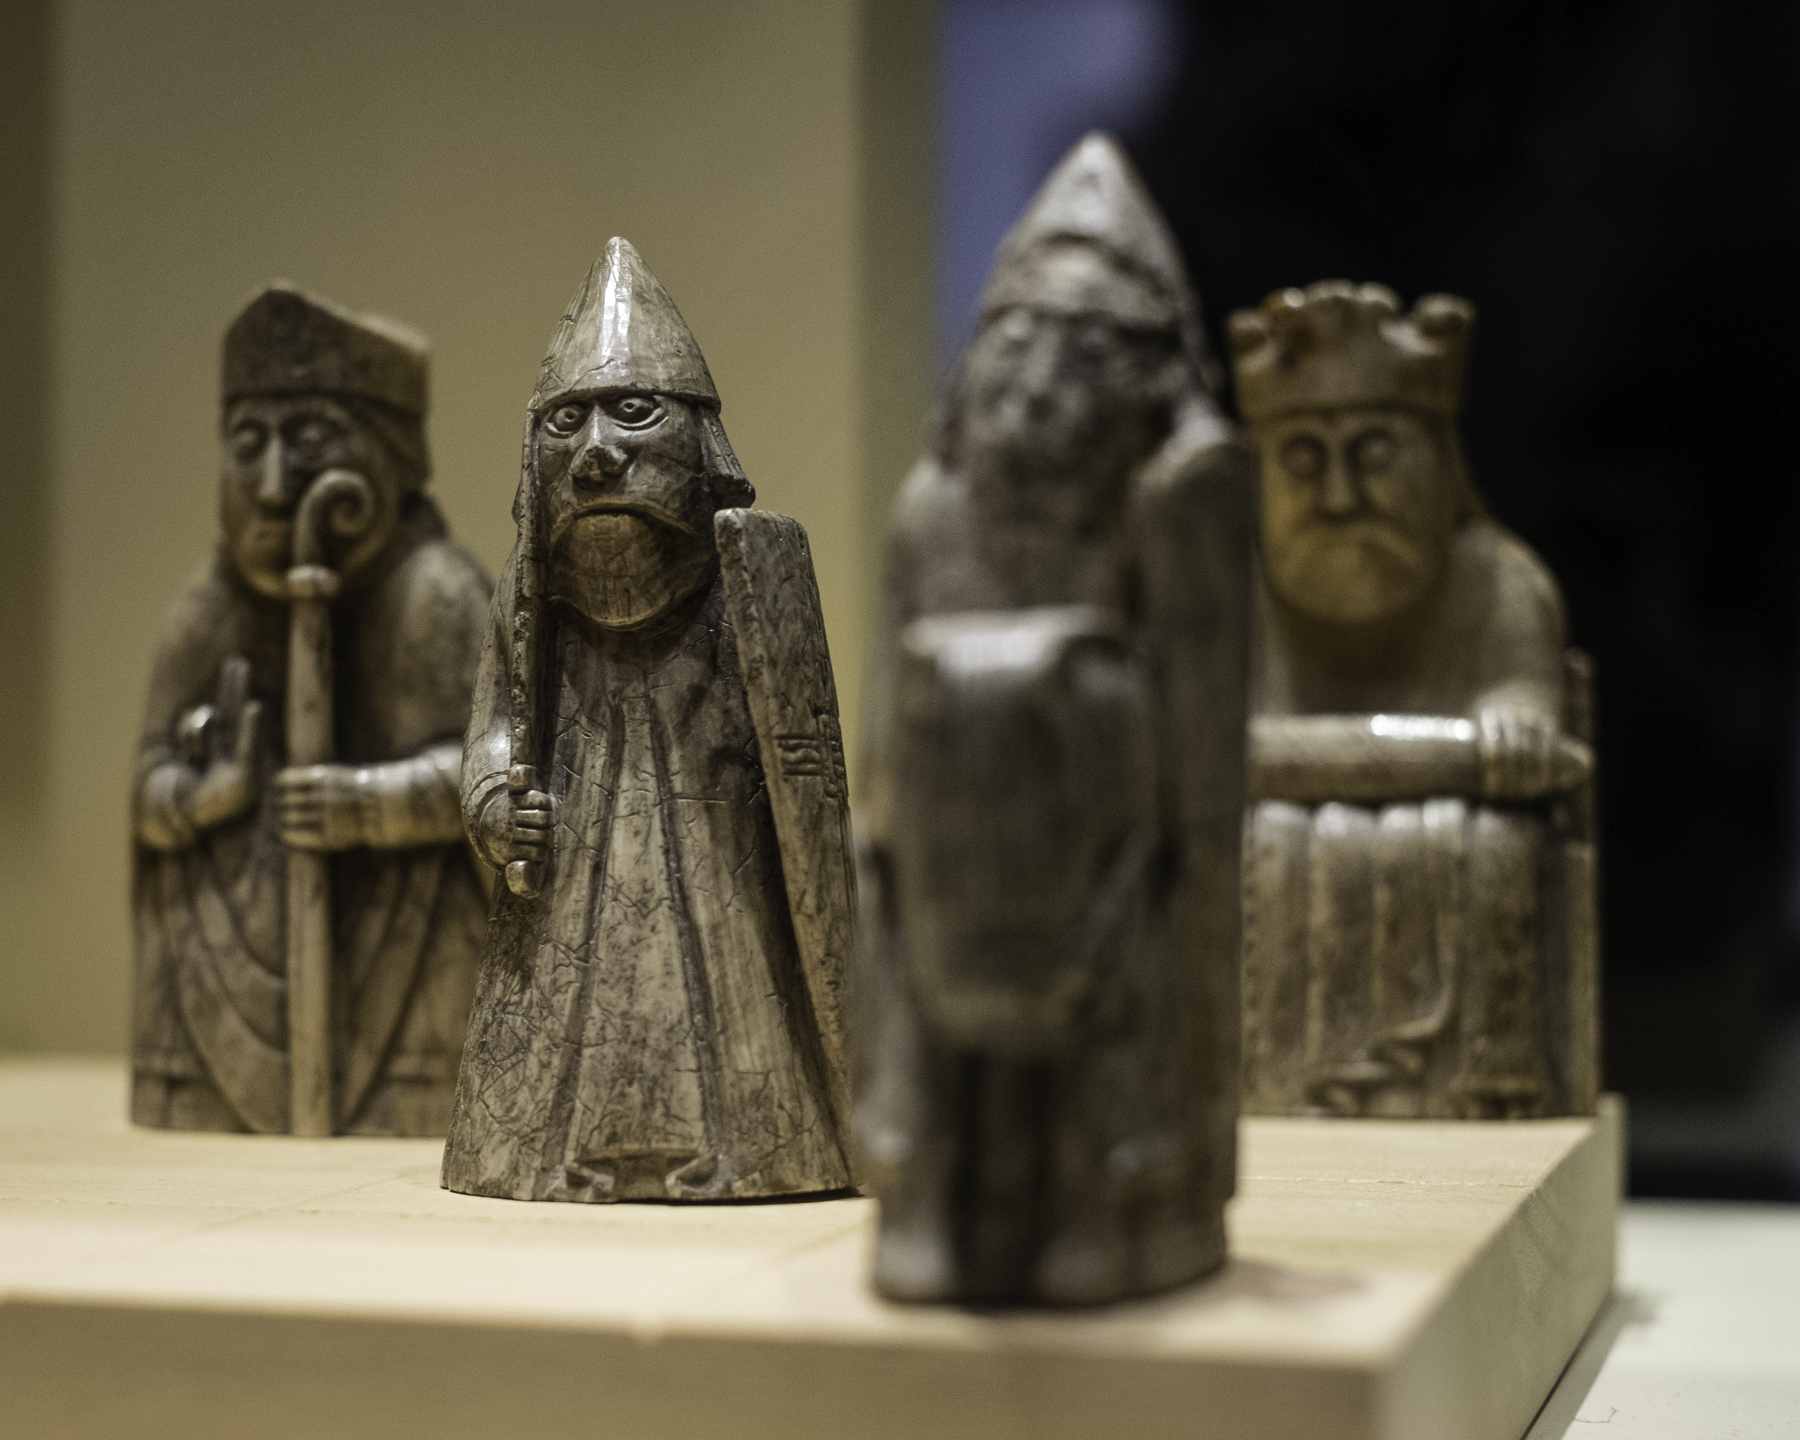 The Lewis Chessmen, National Museum of Scotland, Edinburgh